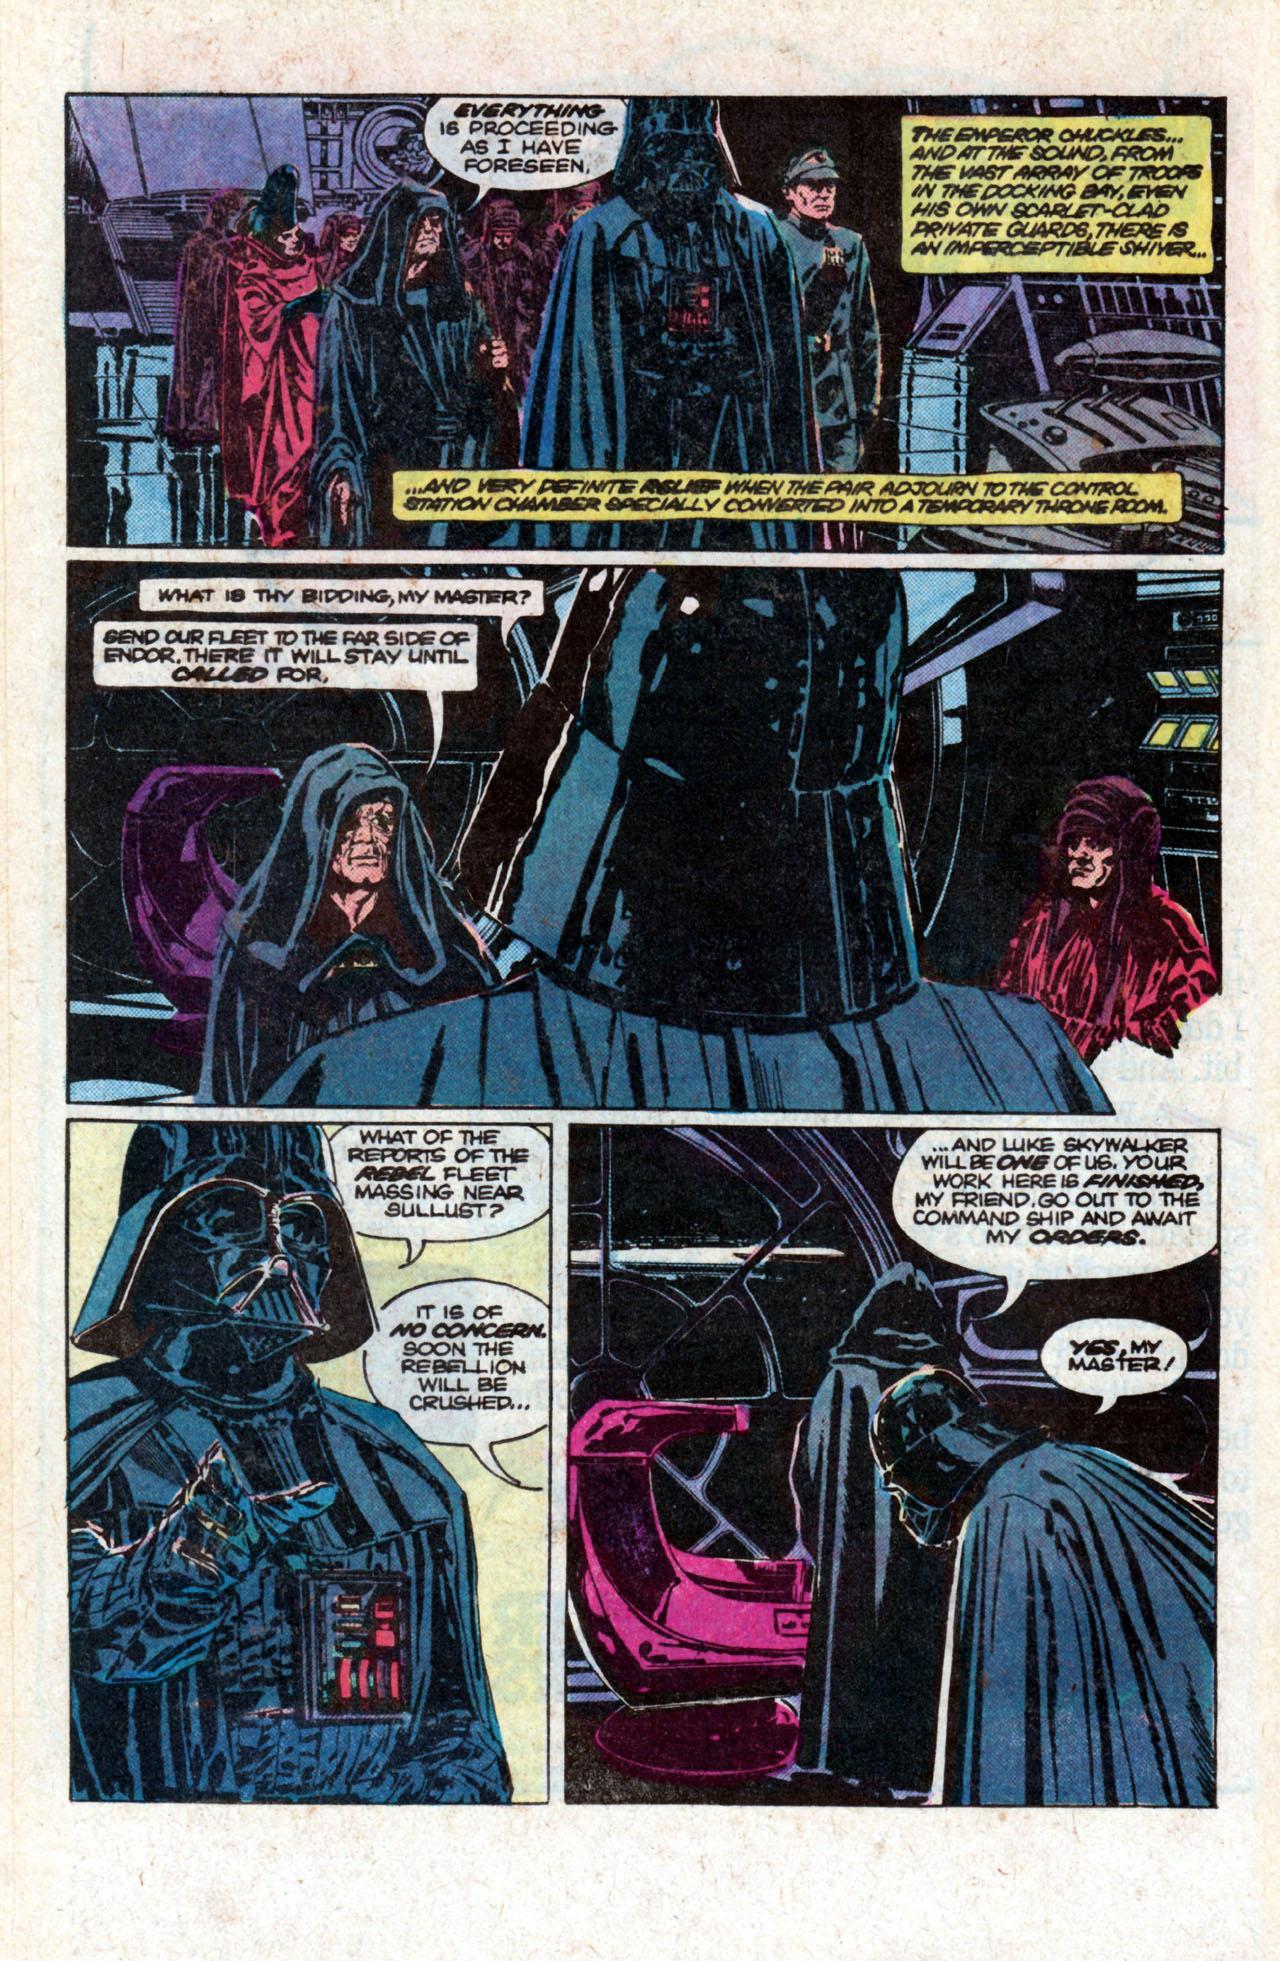 Read online Star Wars: Return of the Jedi comic -  Issue #2 - 19